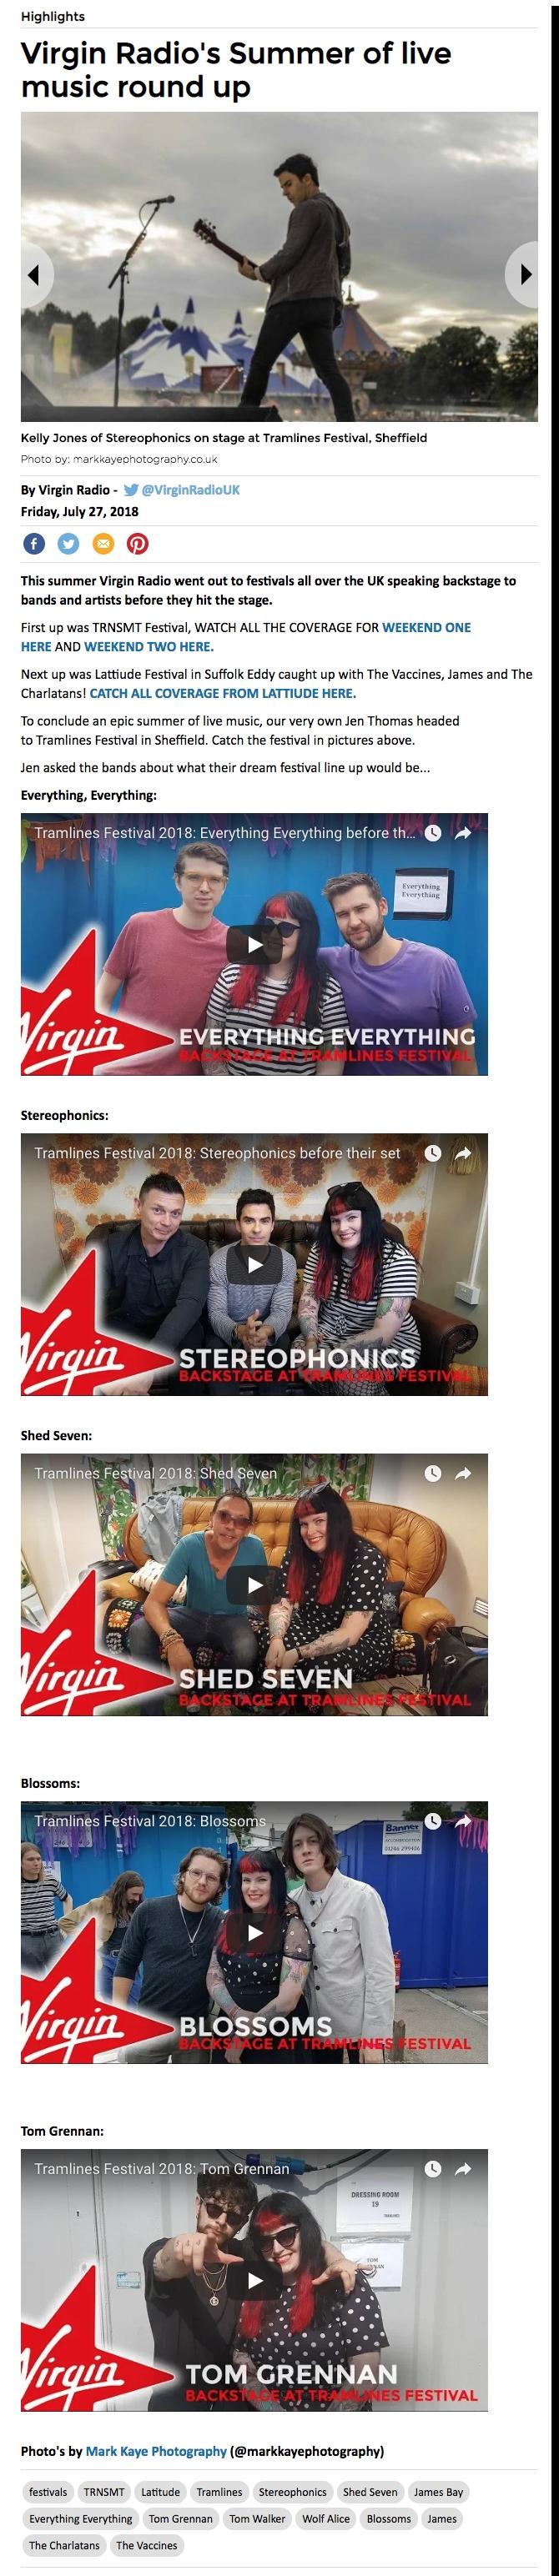 screenshot-virginradio.co.uk-2018.08.29-08-59-46